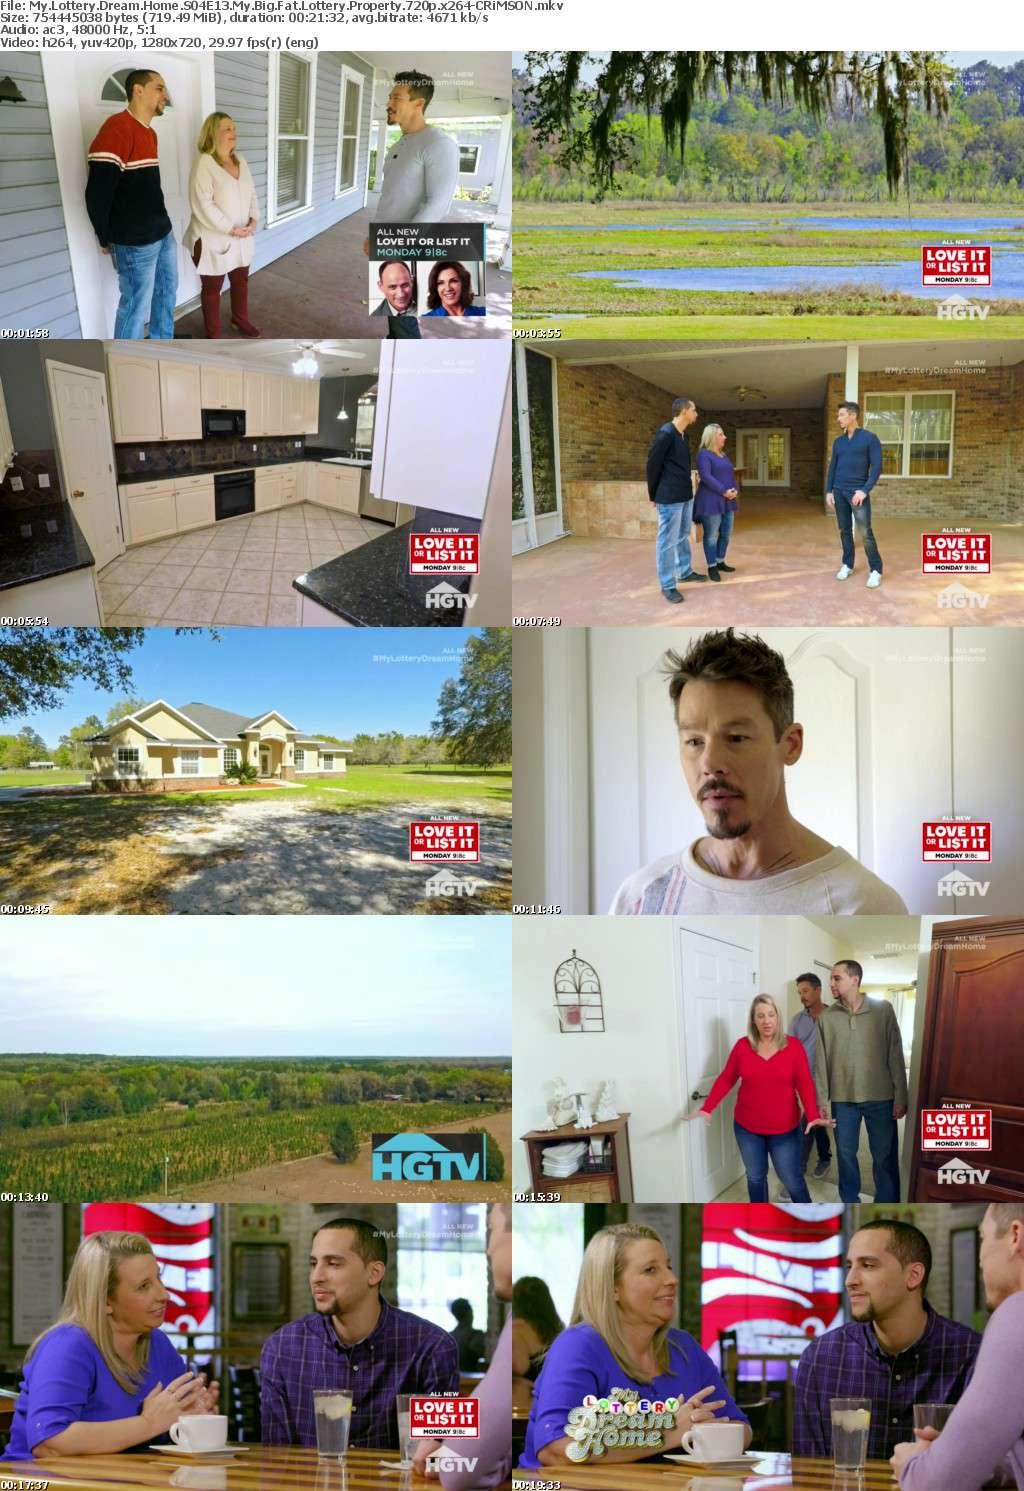 My Lottery Dream Home S04E13 My Big Fat Lottery Property 720p x264-CRiMSON